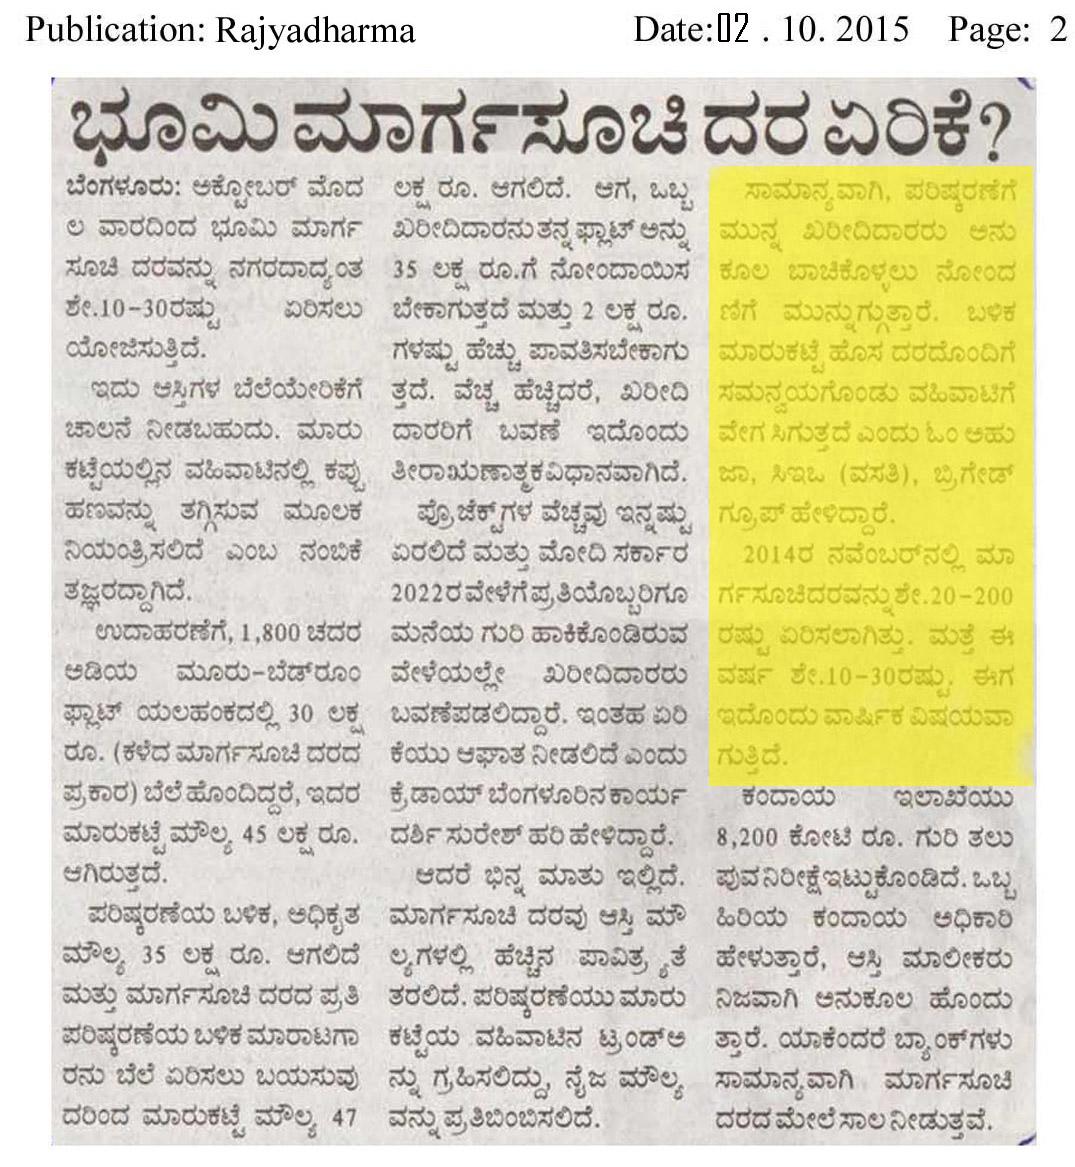 Guidance Value increases - Rajyadharma